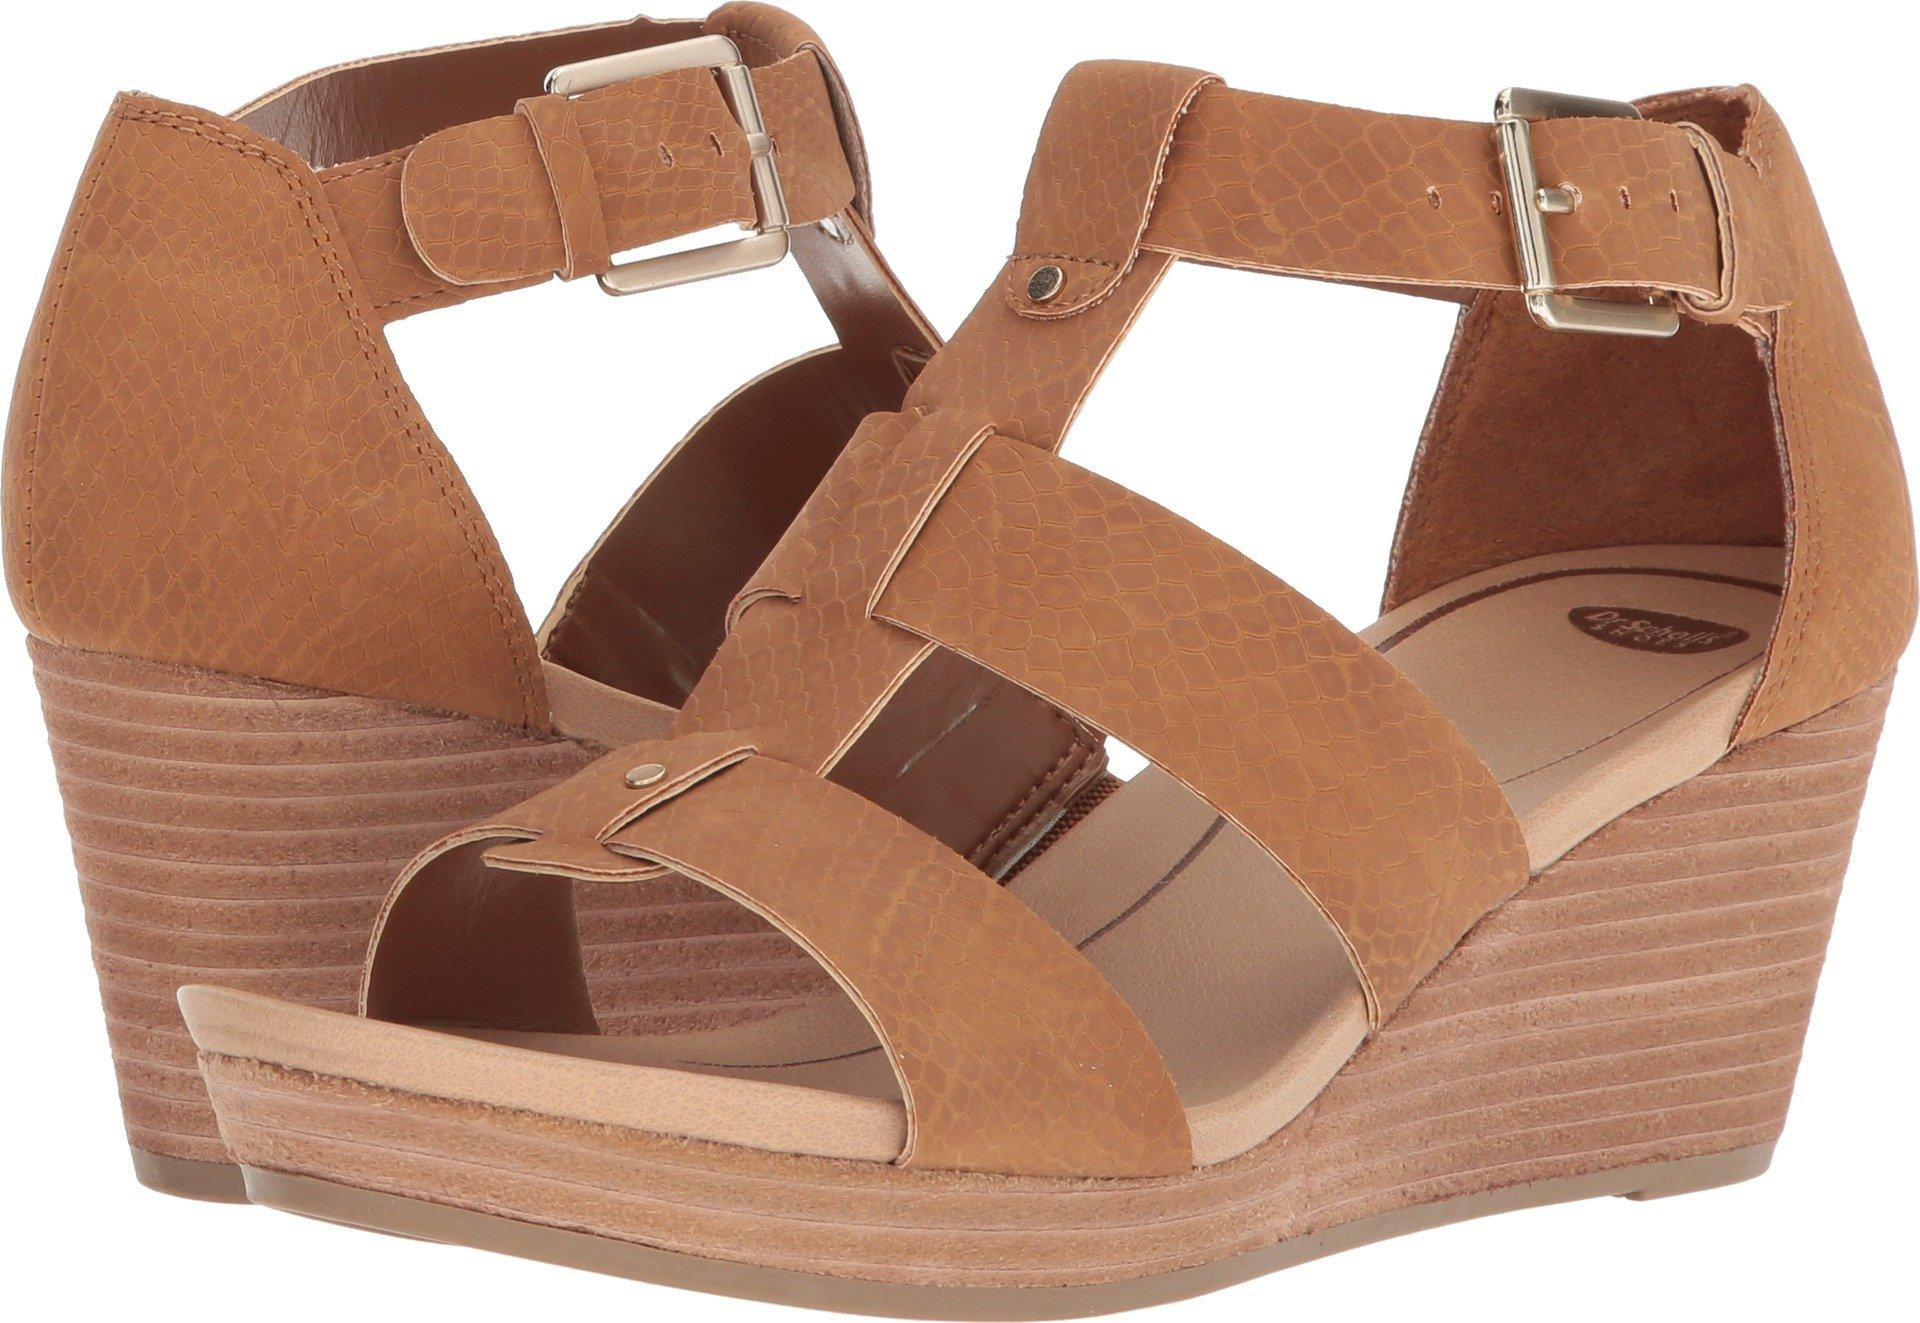 Dr. Scholl's Shoes Women's Barton Wedge Sandal, Saddle Snake Print, 7 M US